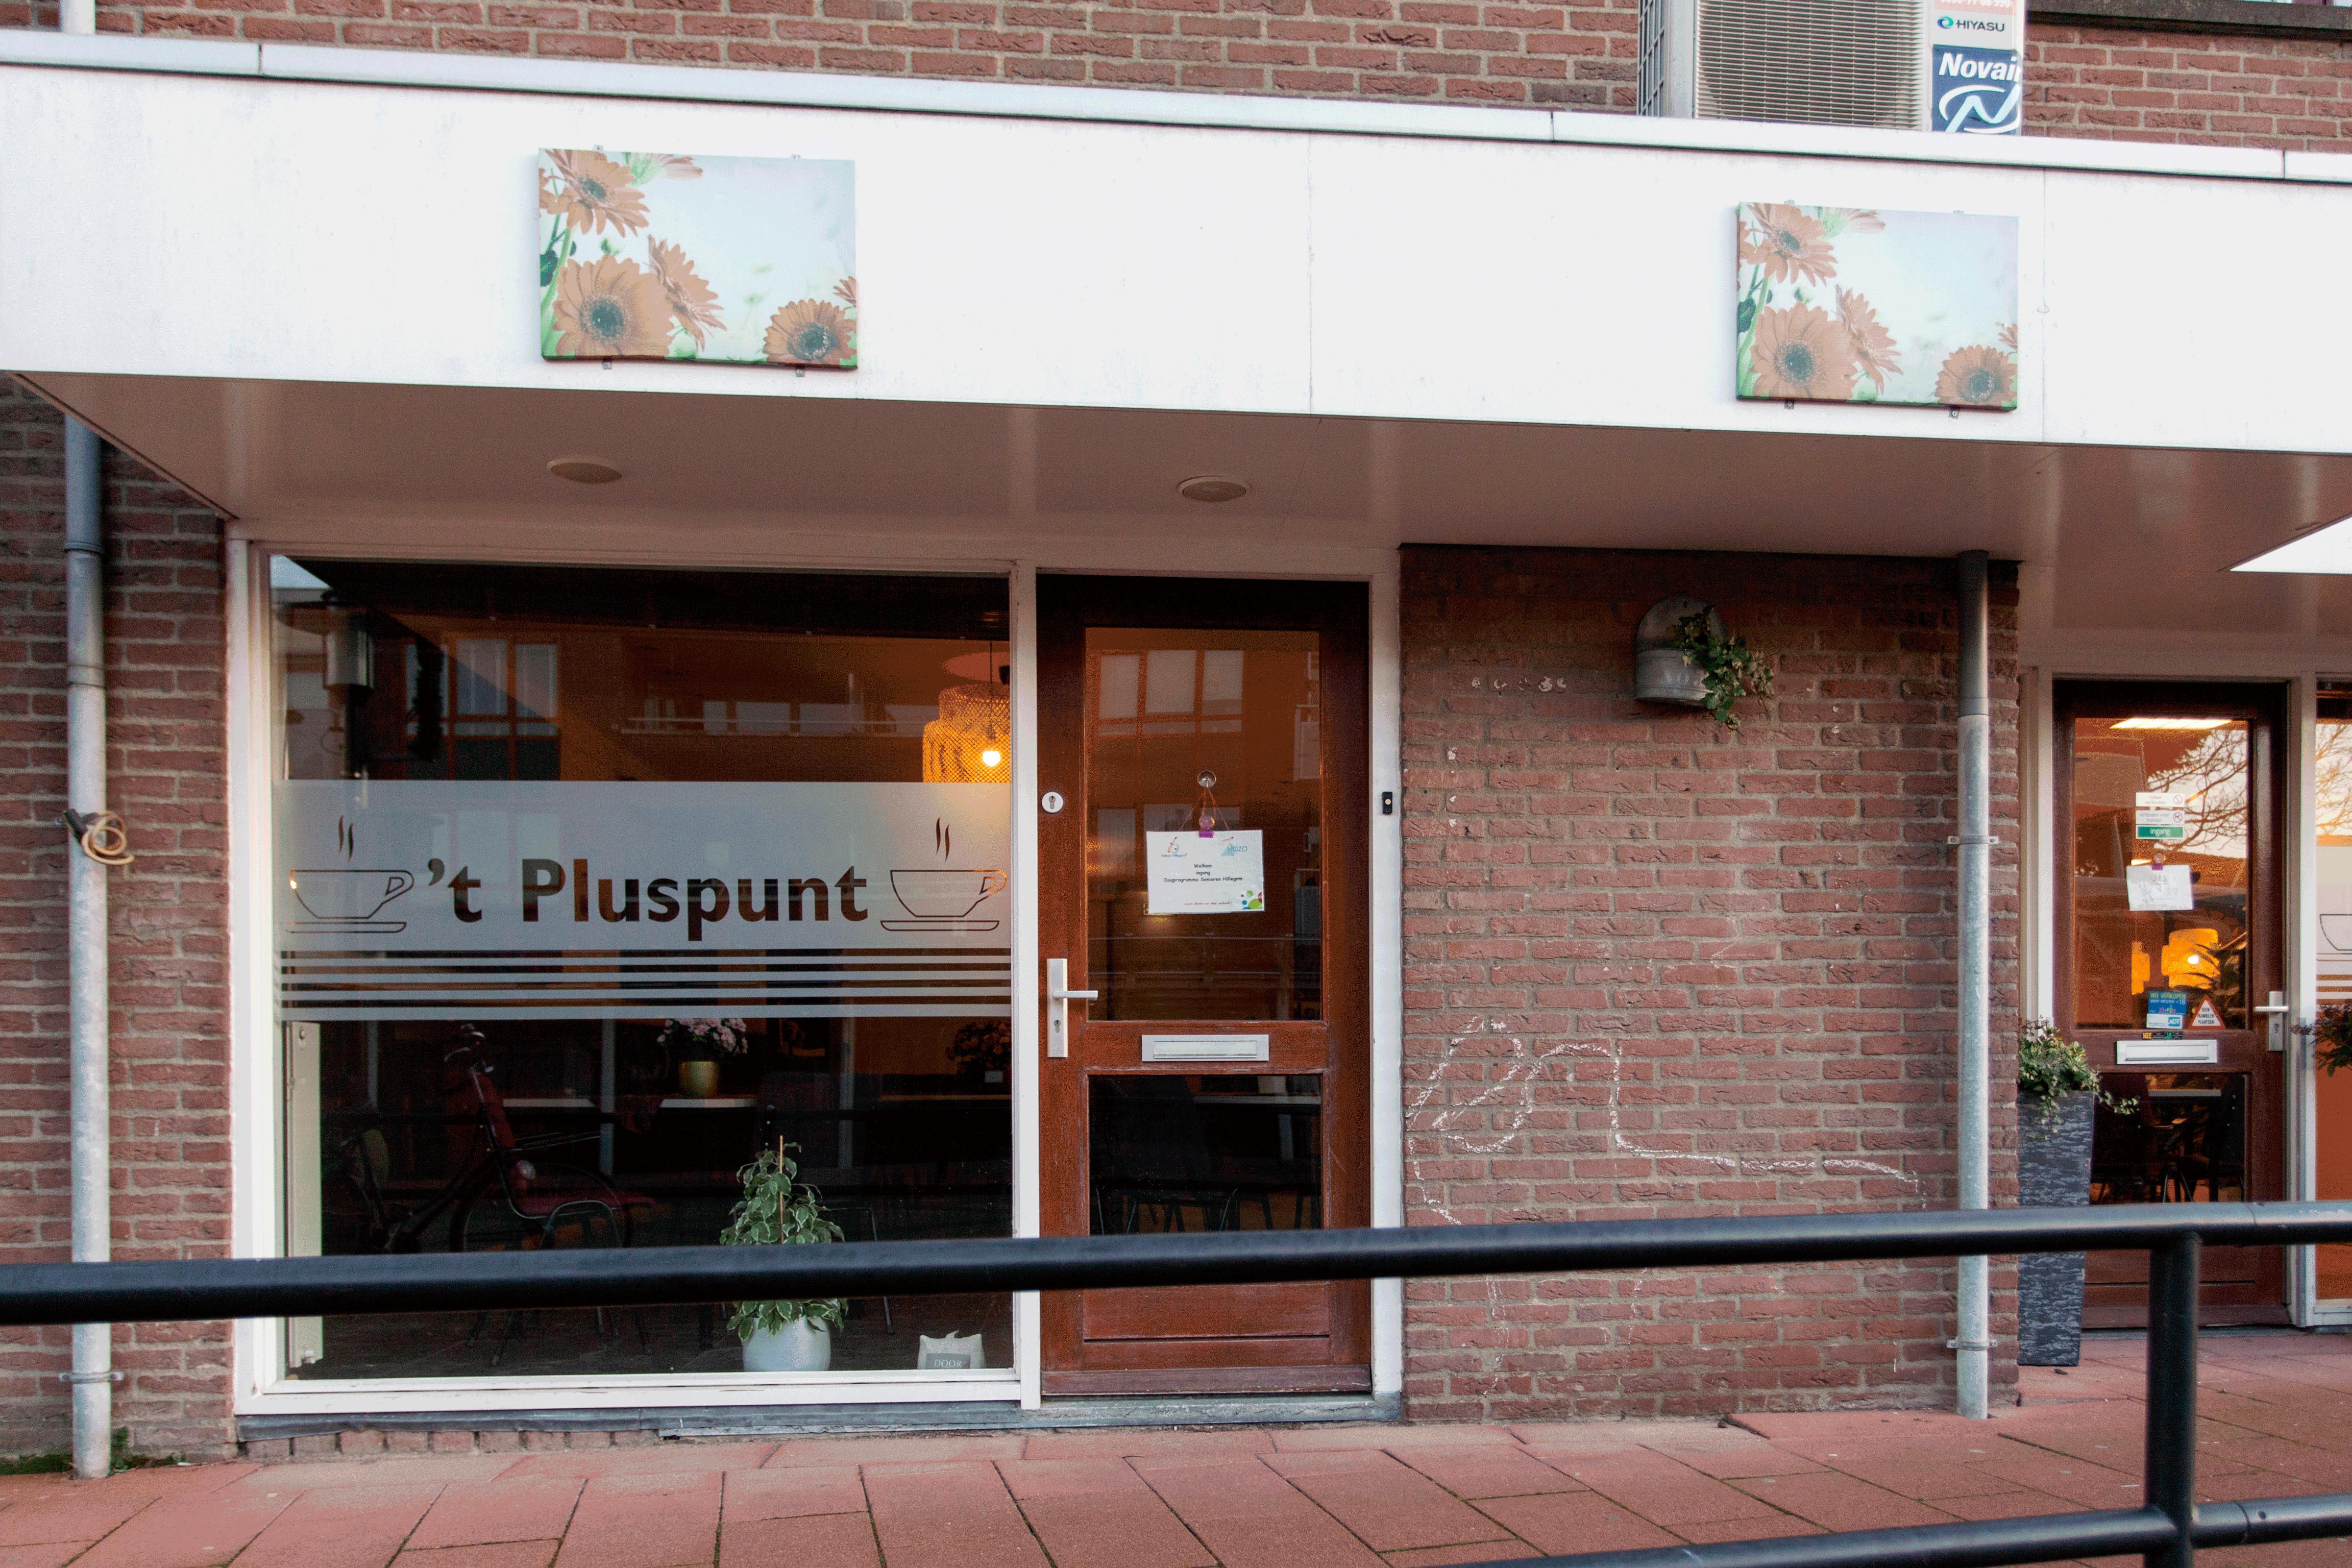 Pluspunt/SWH - Koopcentrum Hillegom